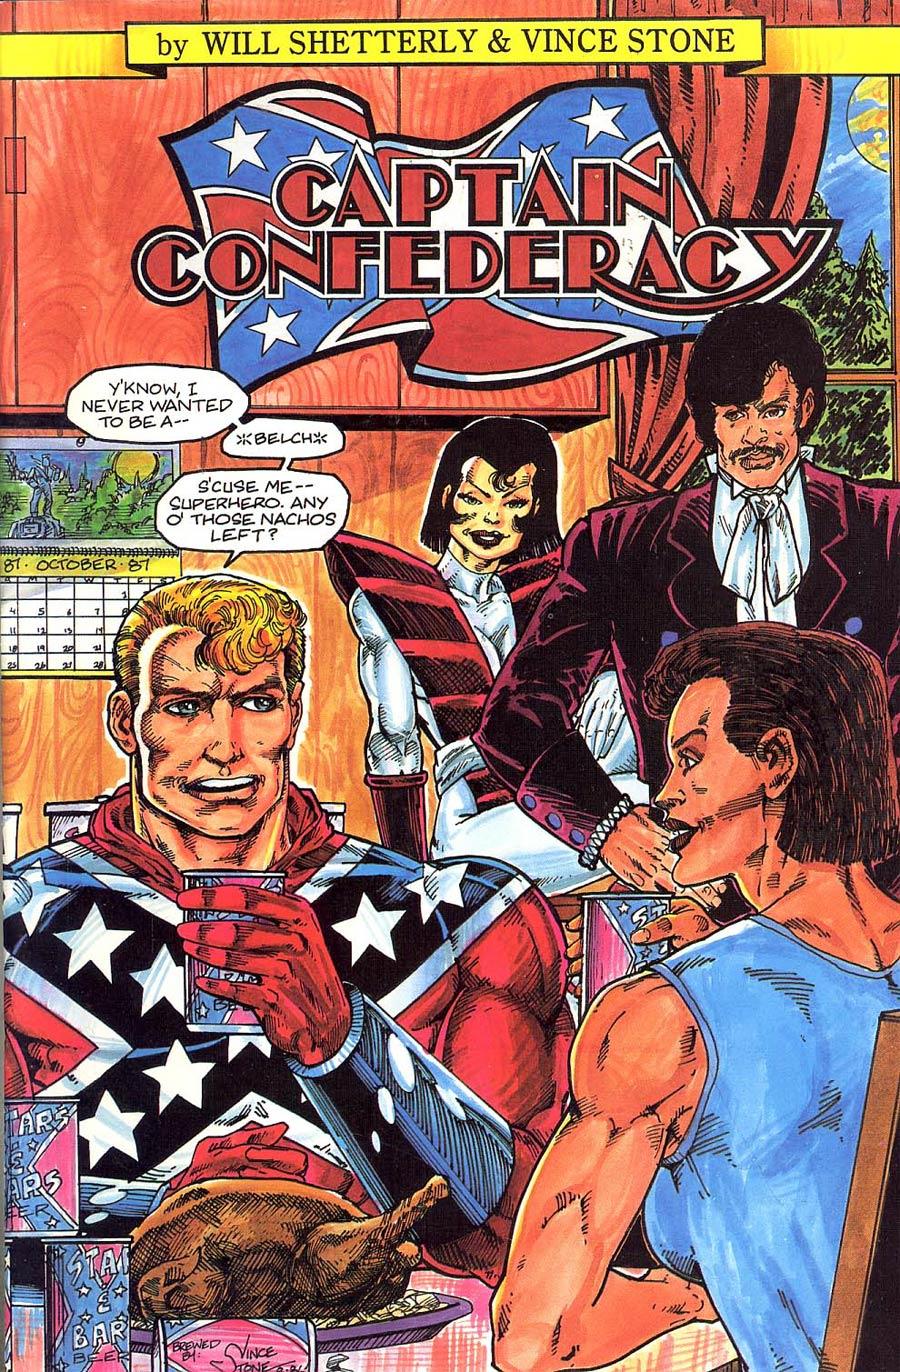 Captain Confederacy #4